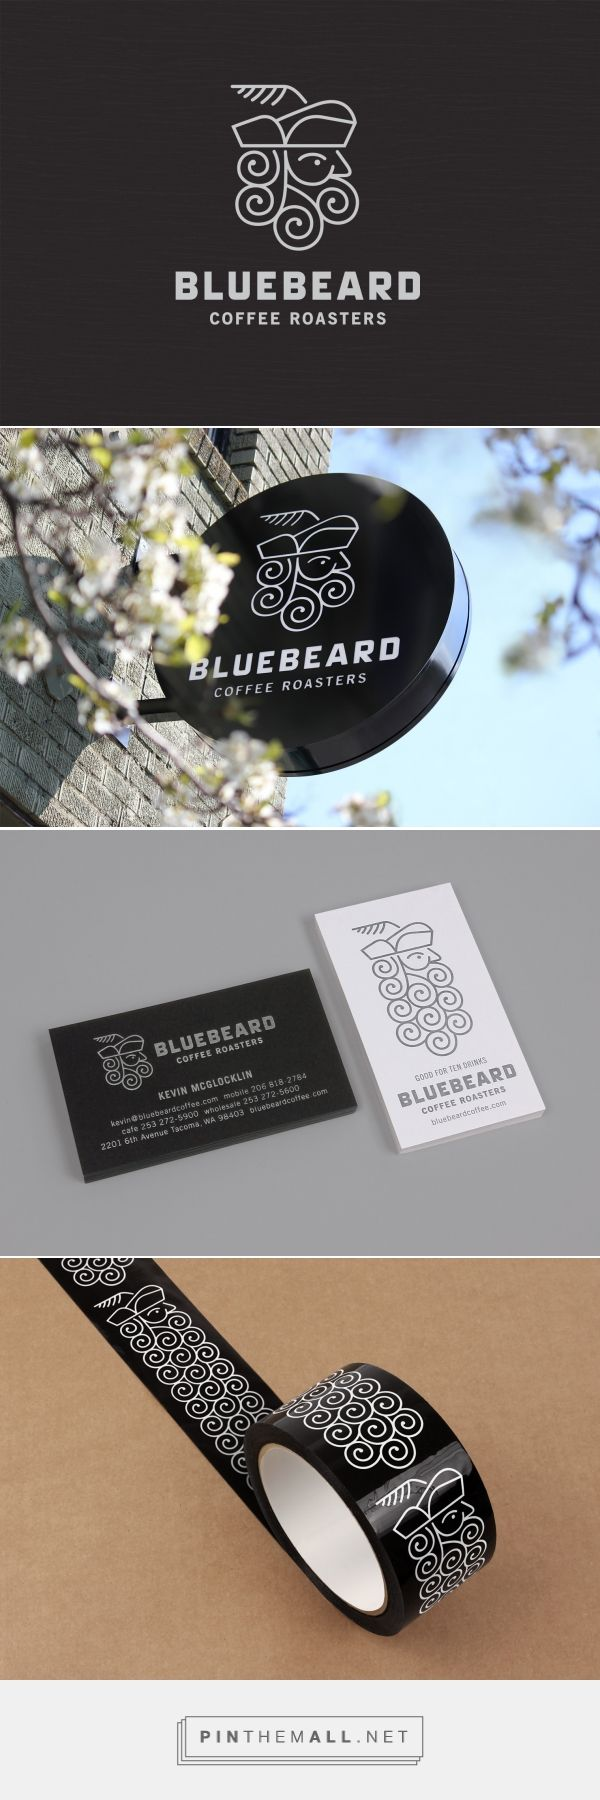 Seattle Branding & Design Firm   Bluebeard Coffee Roasters brand - created via https://pinthemall.net